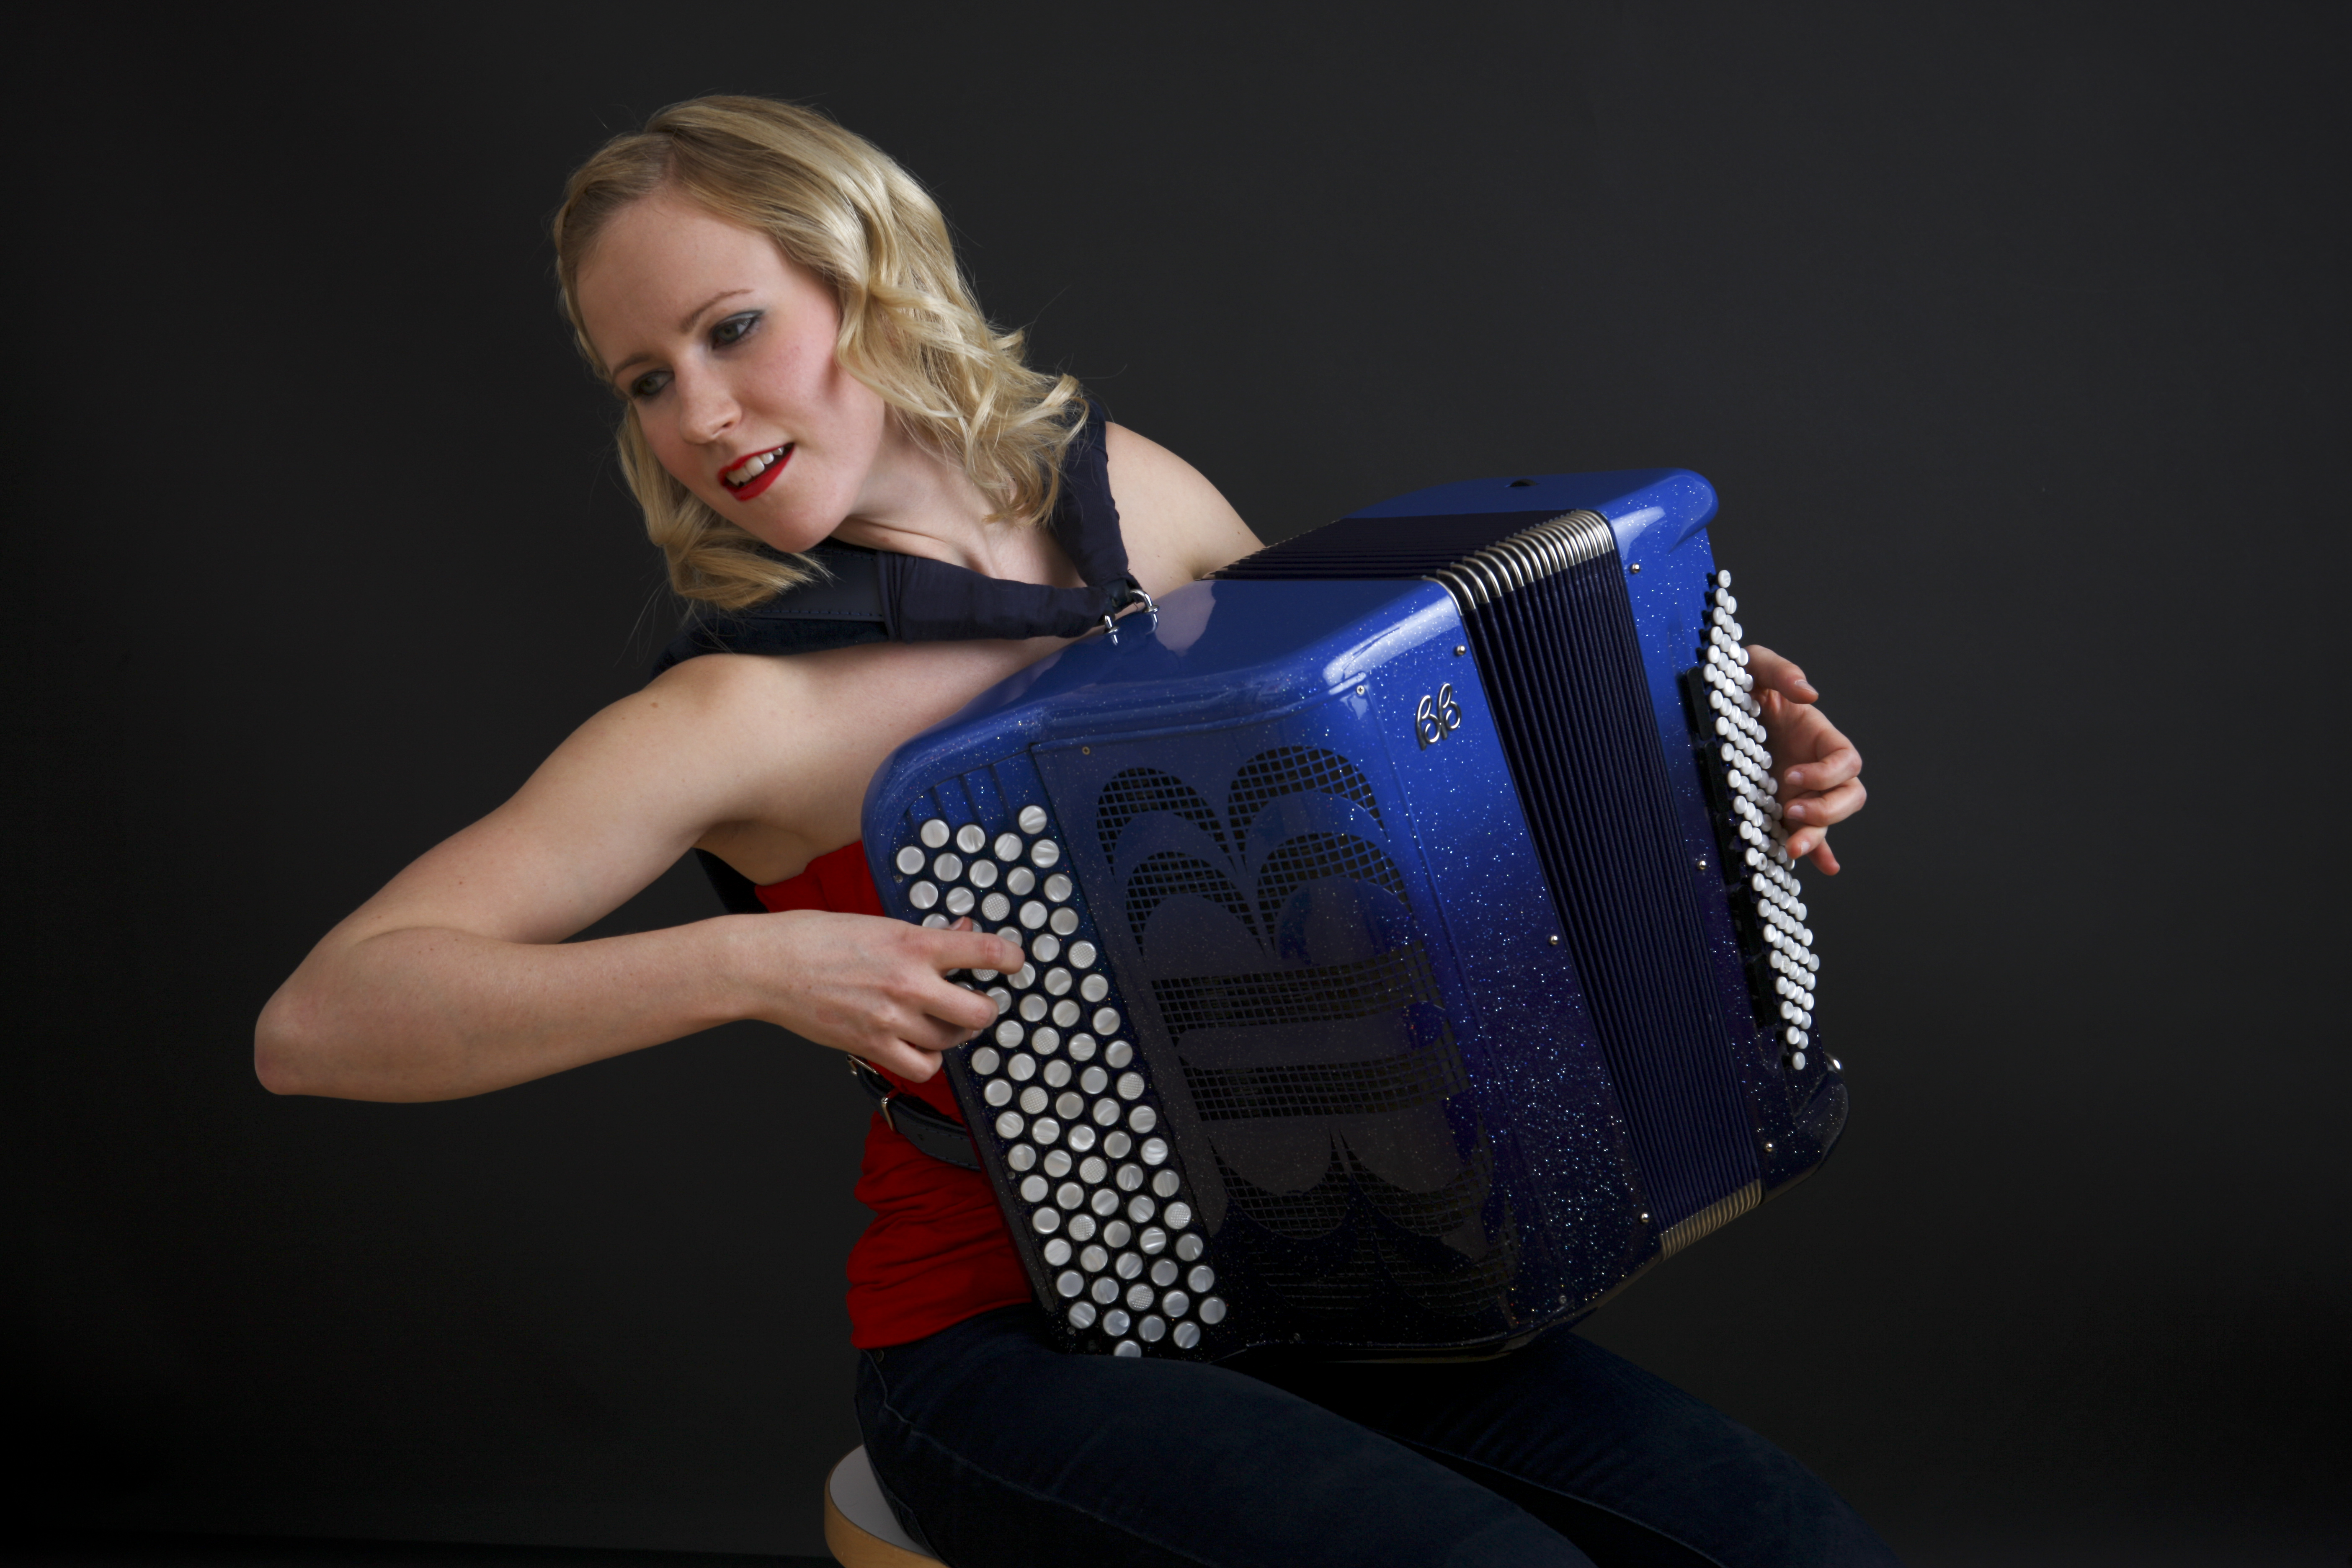 Carnevale by Viivi Maria Saarenkylä accordion CD and eTracks mp3 album